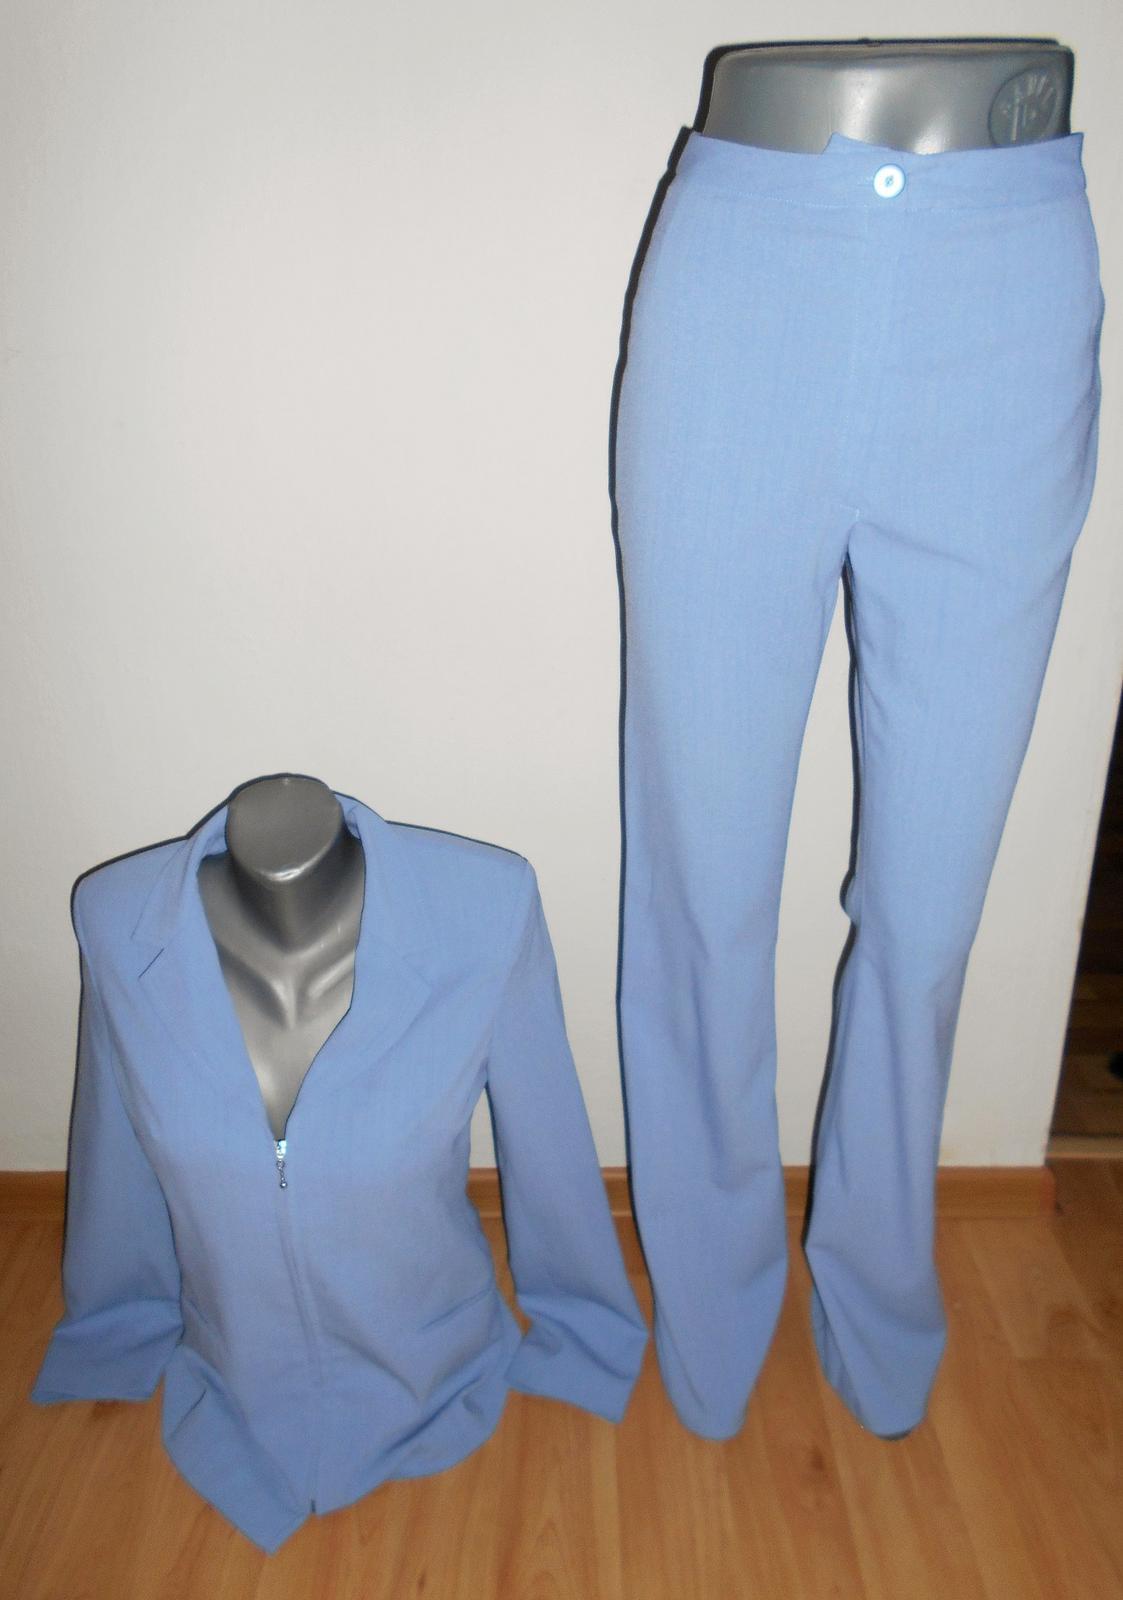 Sako, šaty a nohavice - Obrázok č. 3